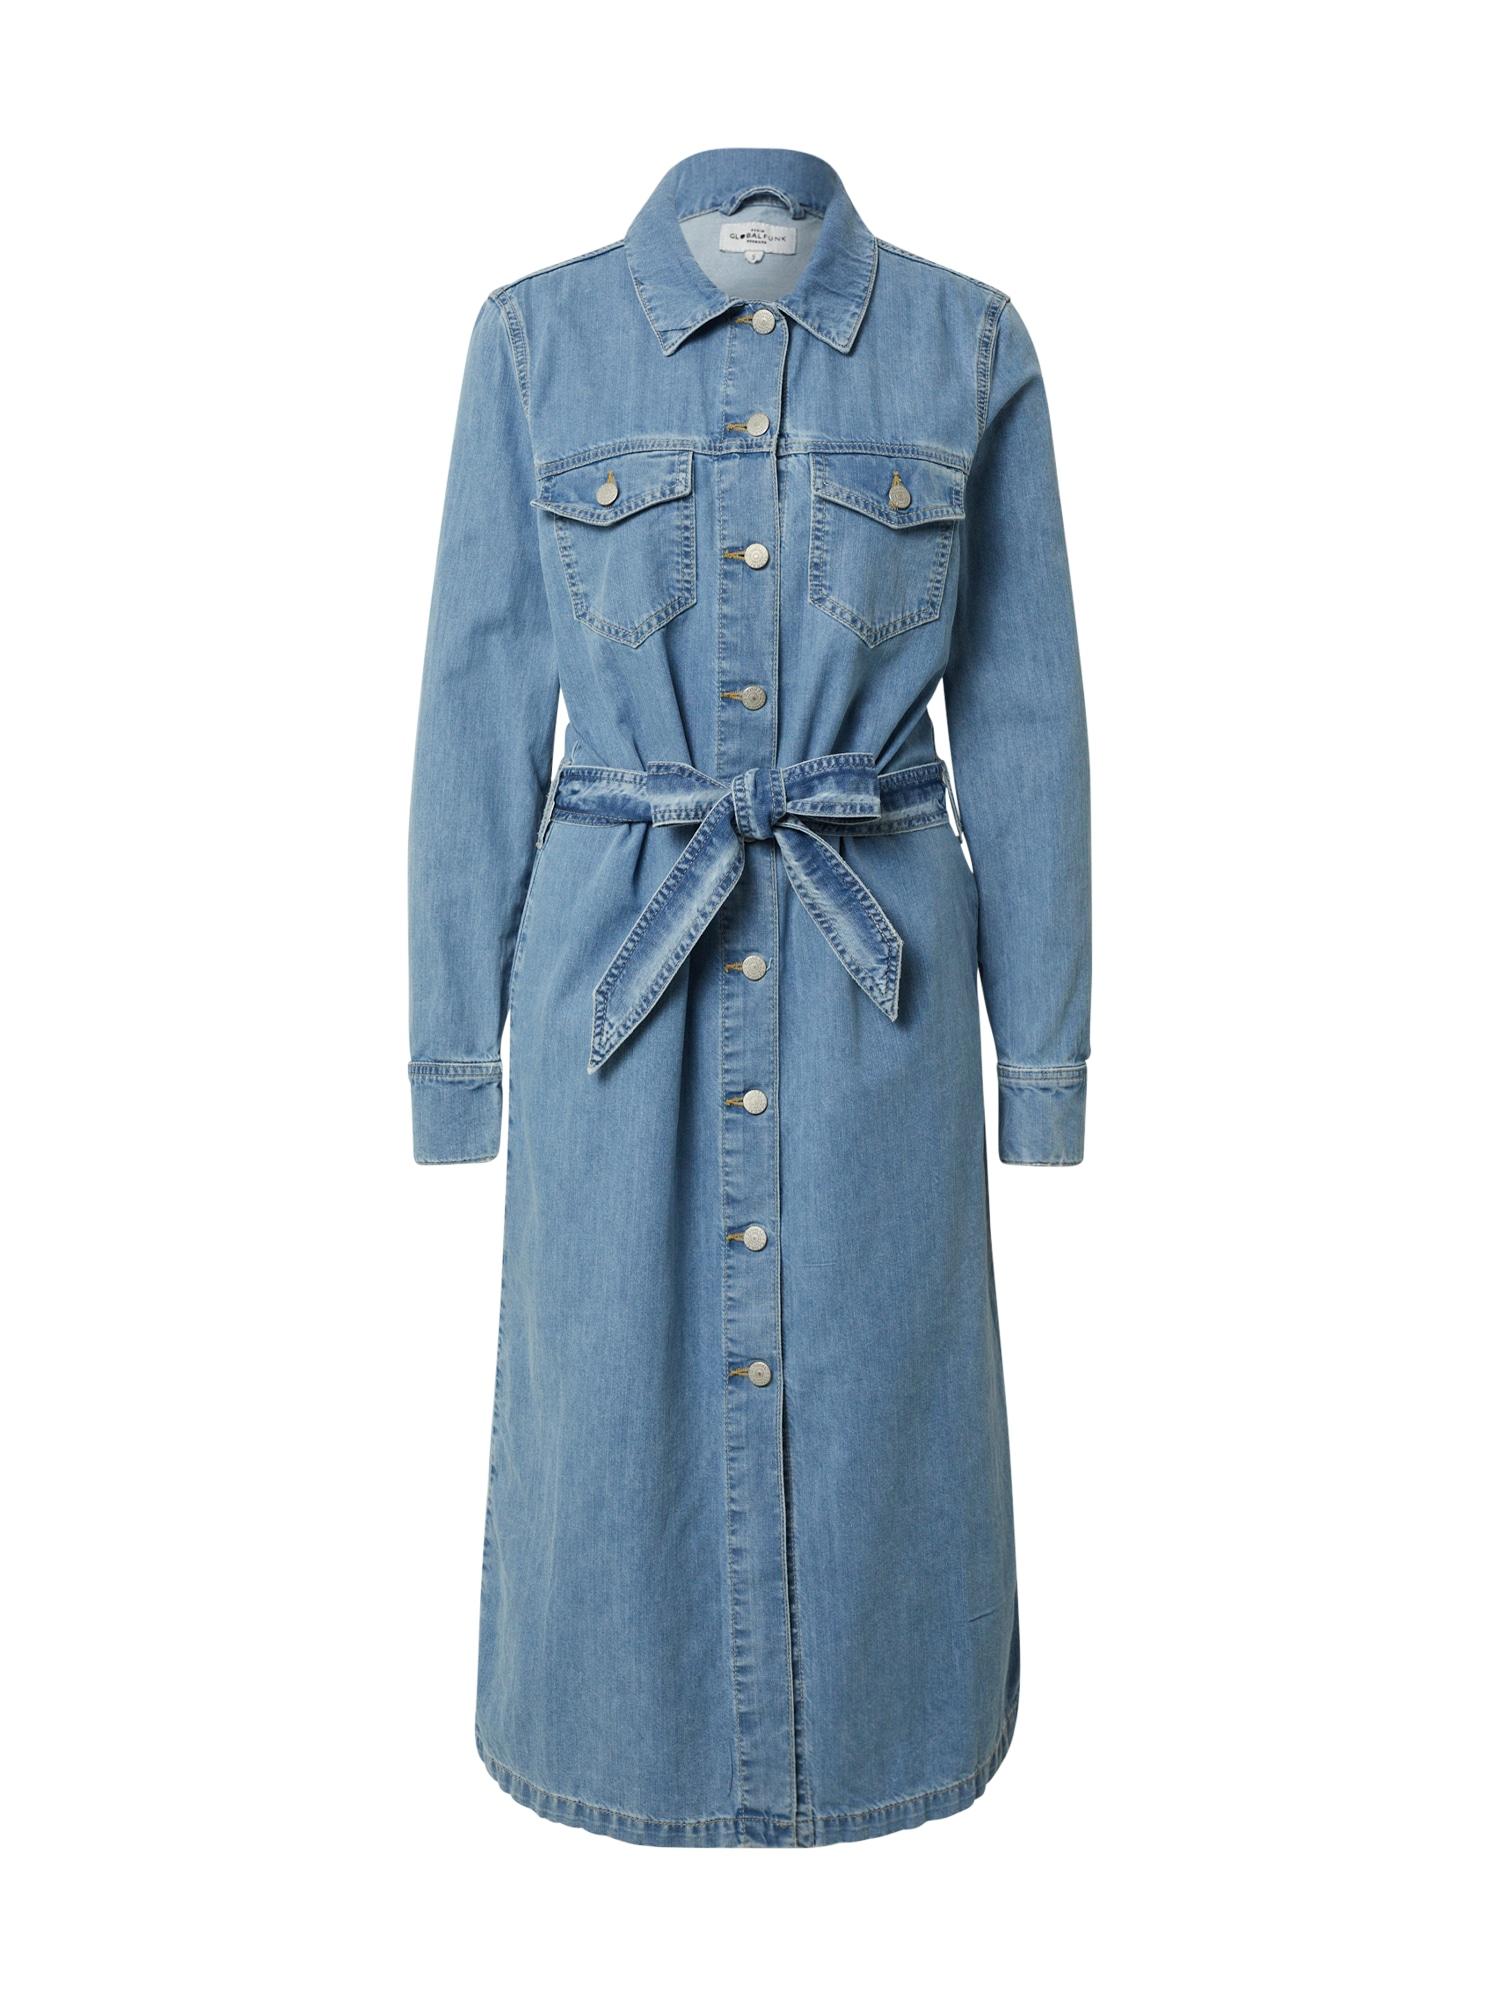 Global Funk Suknelė 'Elmira' mėlyna